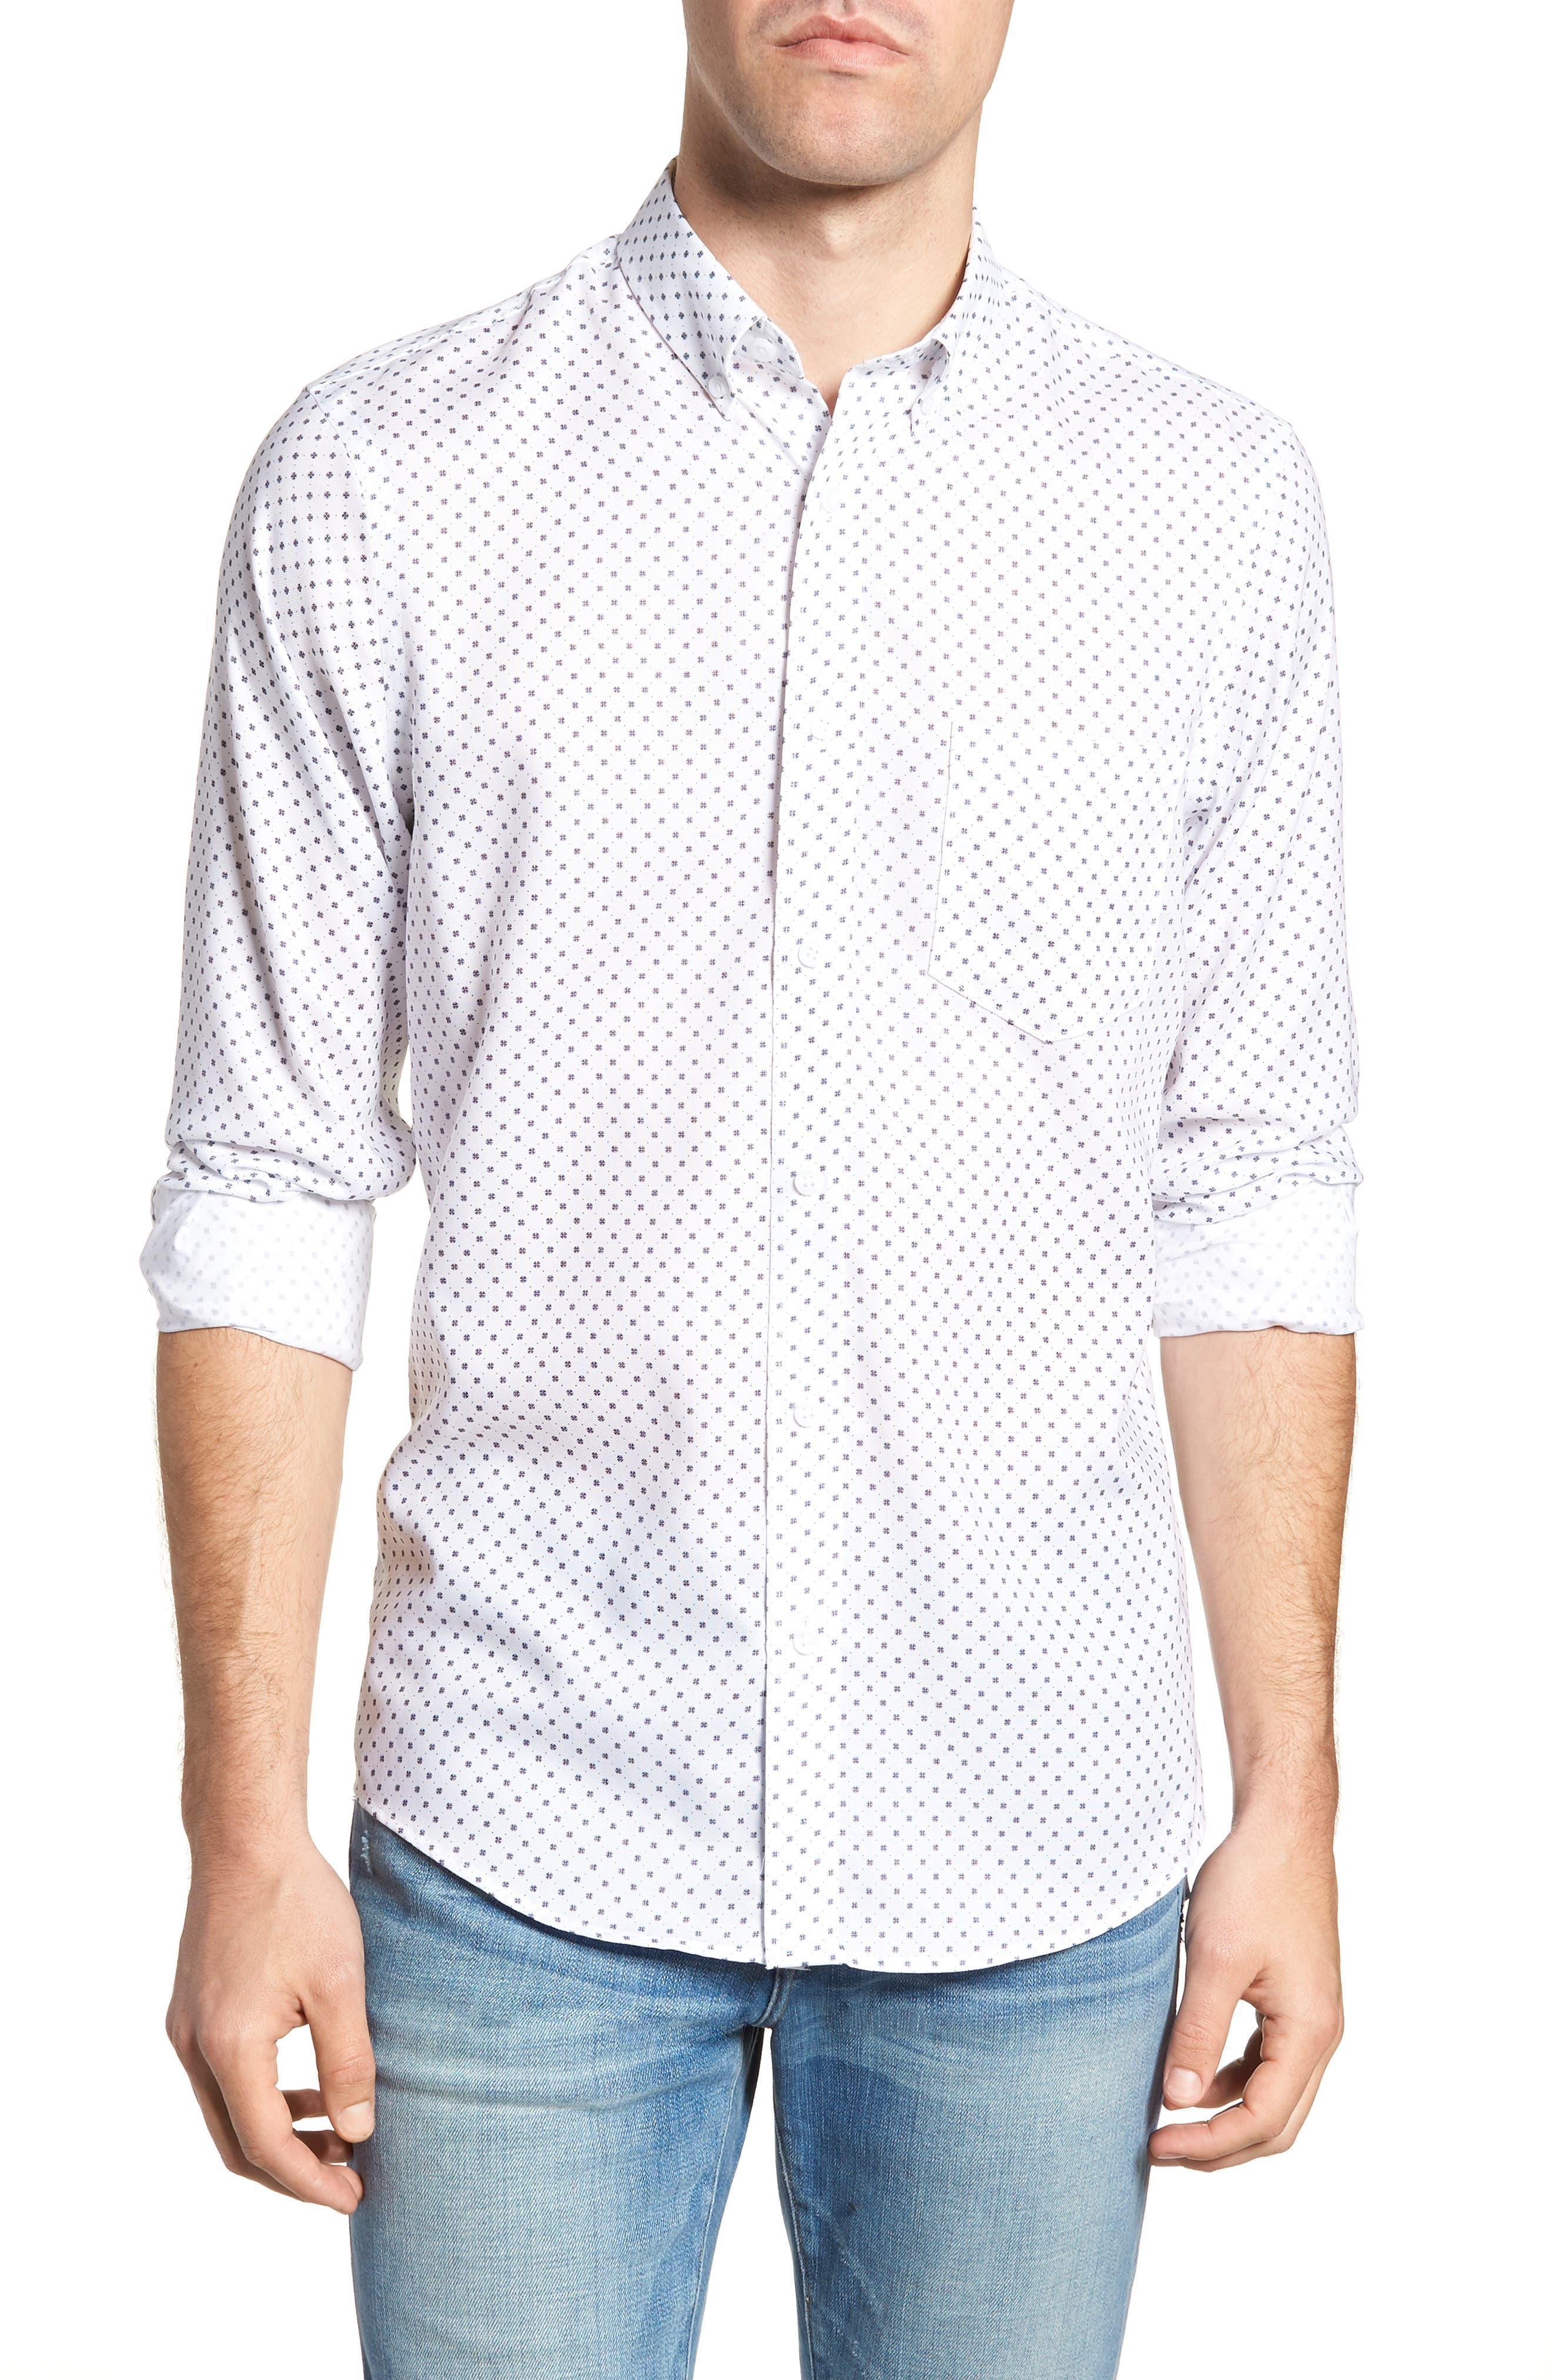 Regular Fit Dobby Print Sport Shirt,                         Main,                         color, White Navy Dobby Print